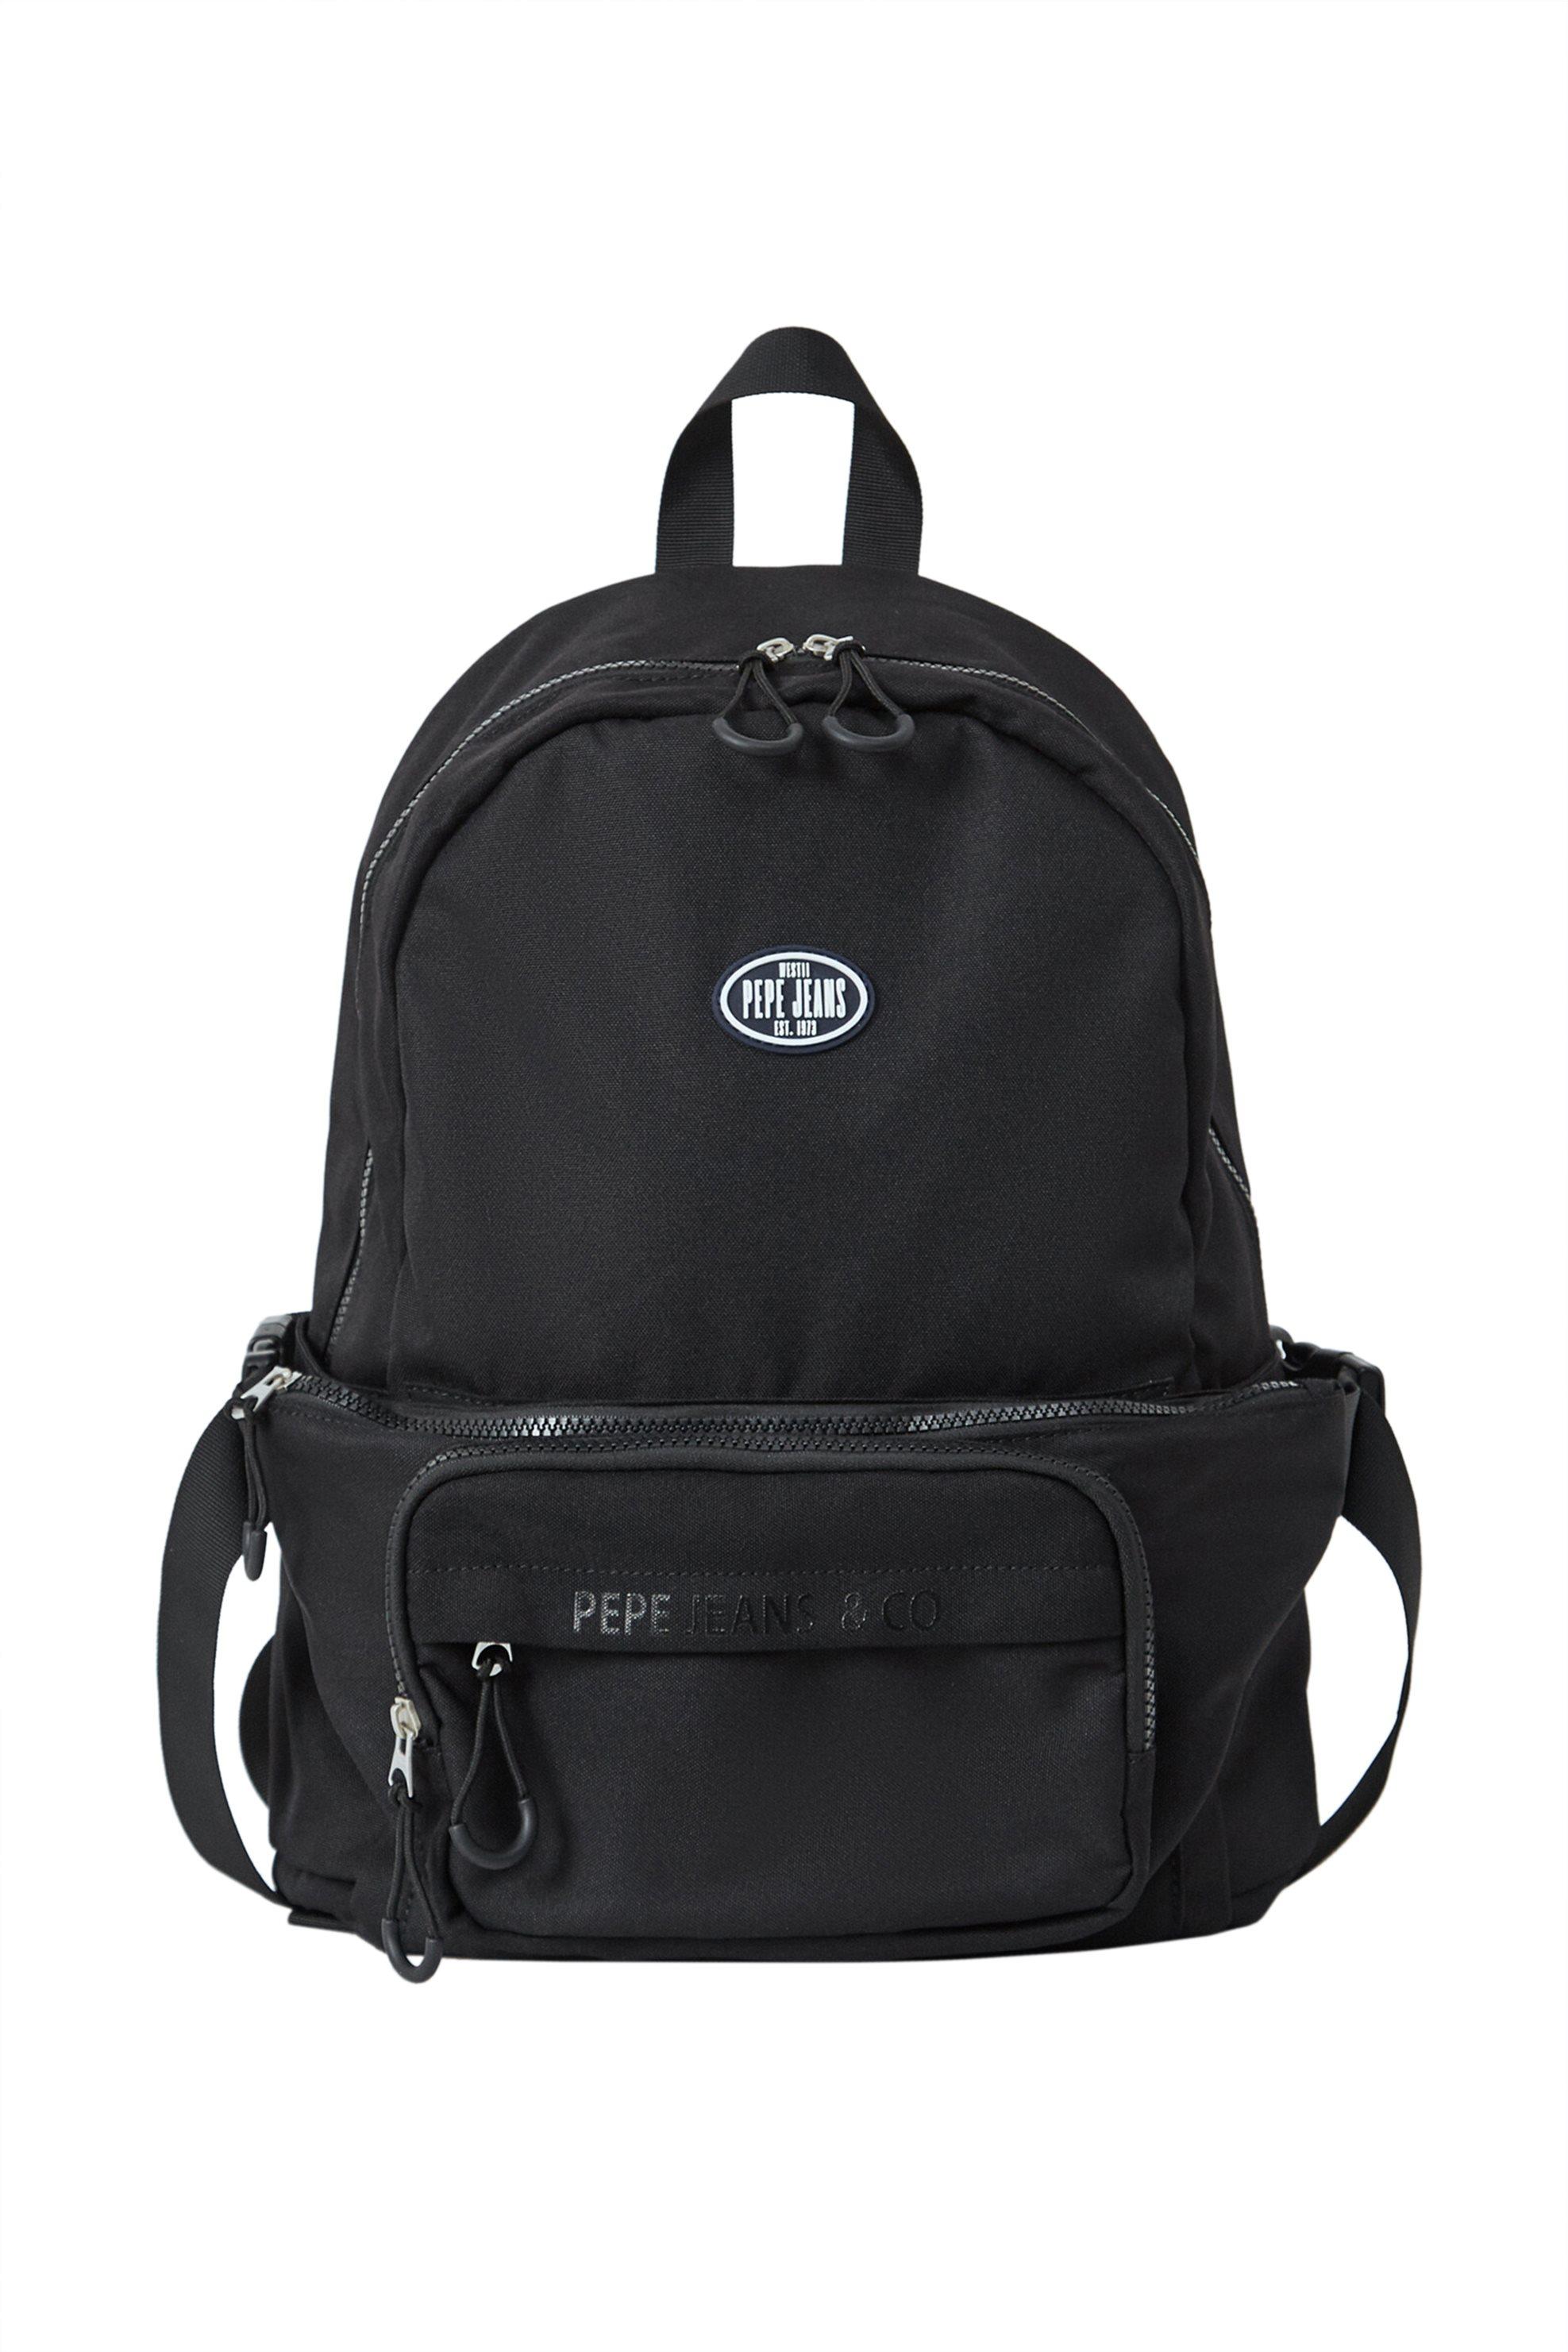 Pepe Jeans ανδρικό backpack με αποσπώμενο τσαντάκι μέσης ''Octavio'' - PM030615 - Μαύρο